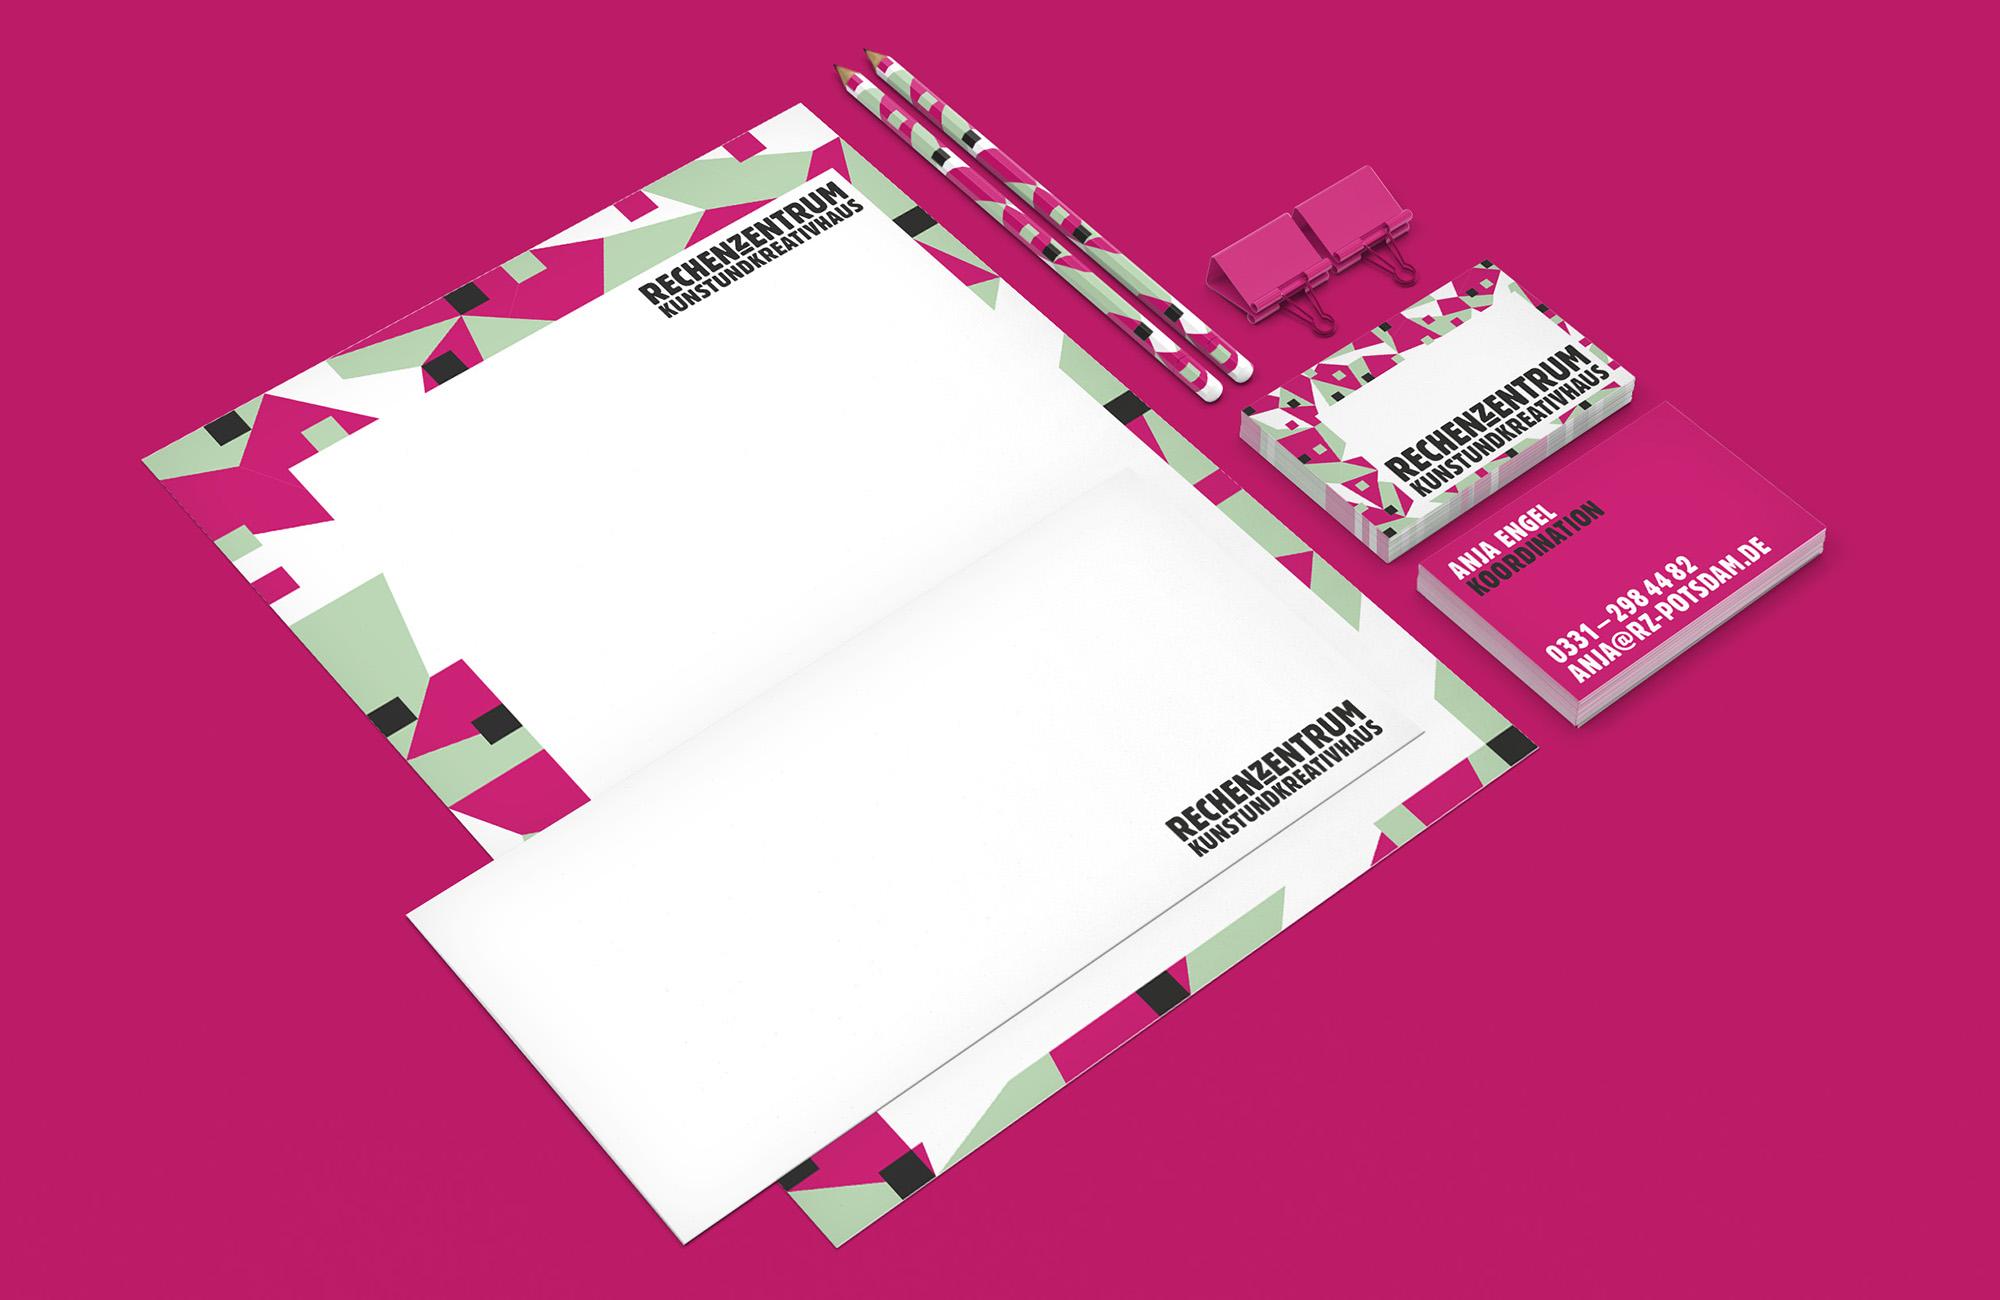 Corporate Design Rechenzentrum Potsdam Geschäftsausstattung